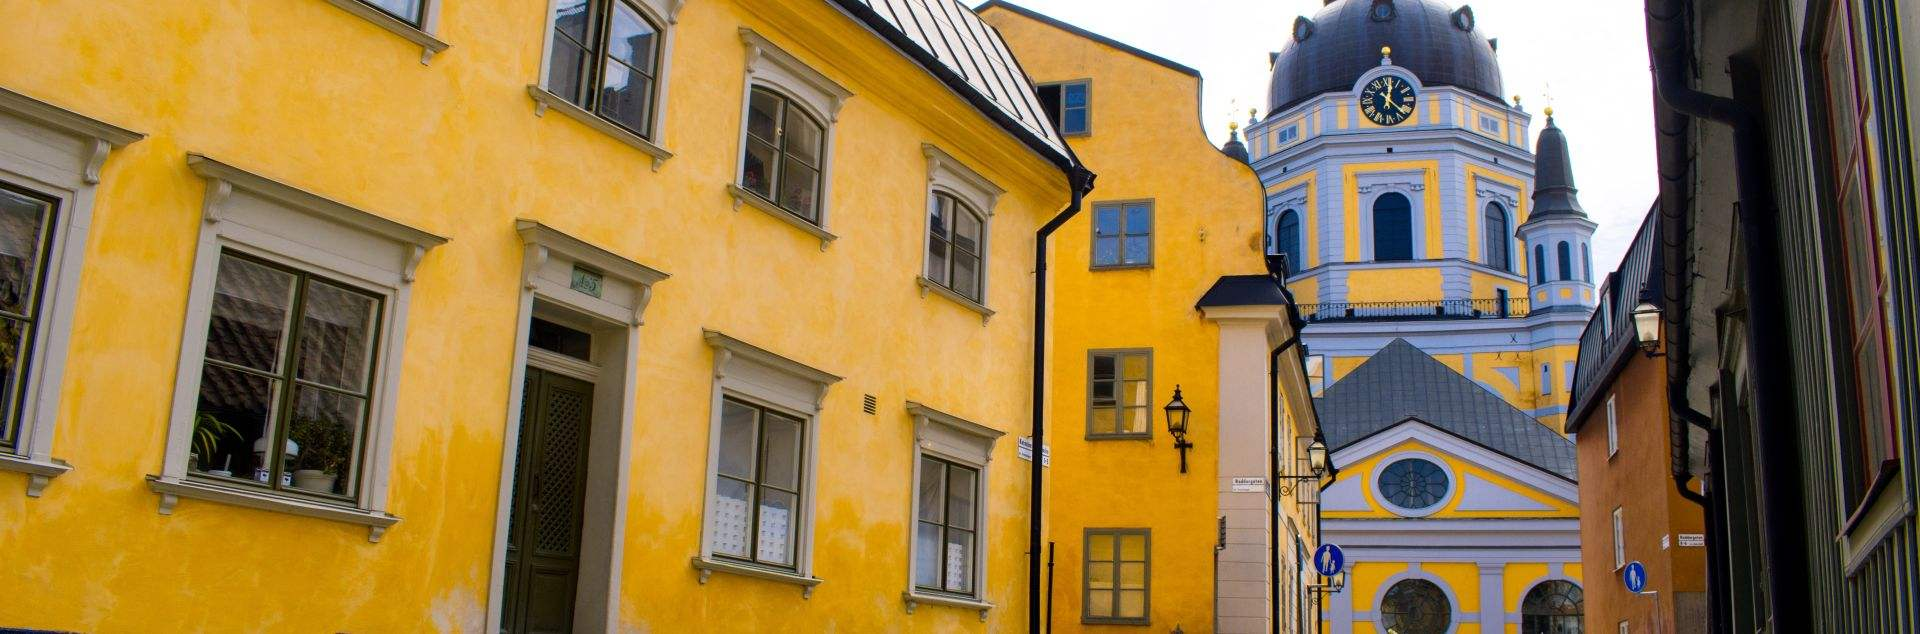 Guided walking tour Stockholm